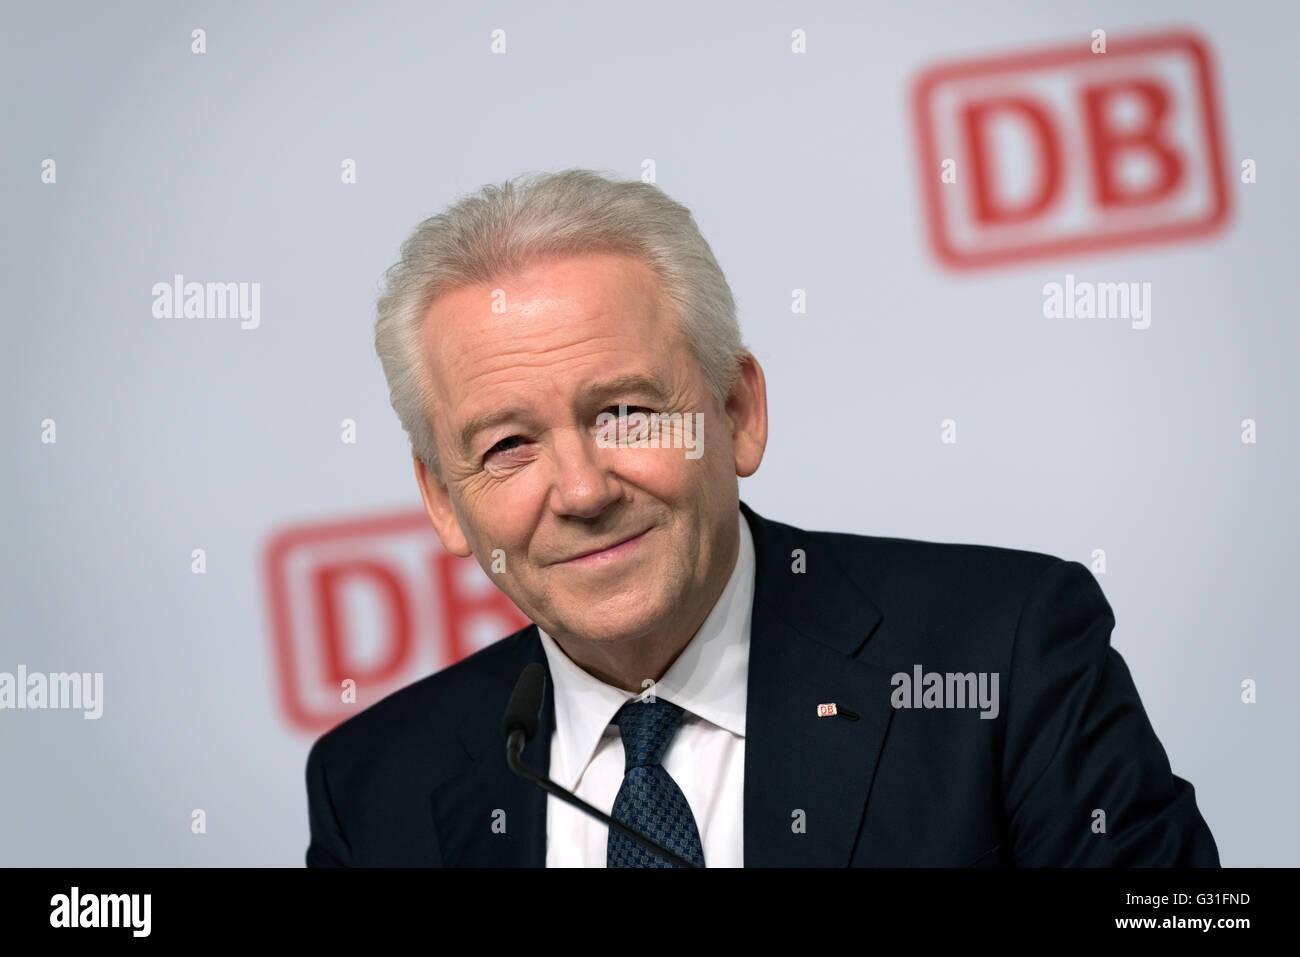 Berlin, Germany, Ruediger Grube, CEO of Deutsche Bahn - Stock Image